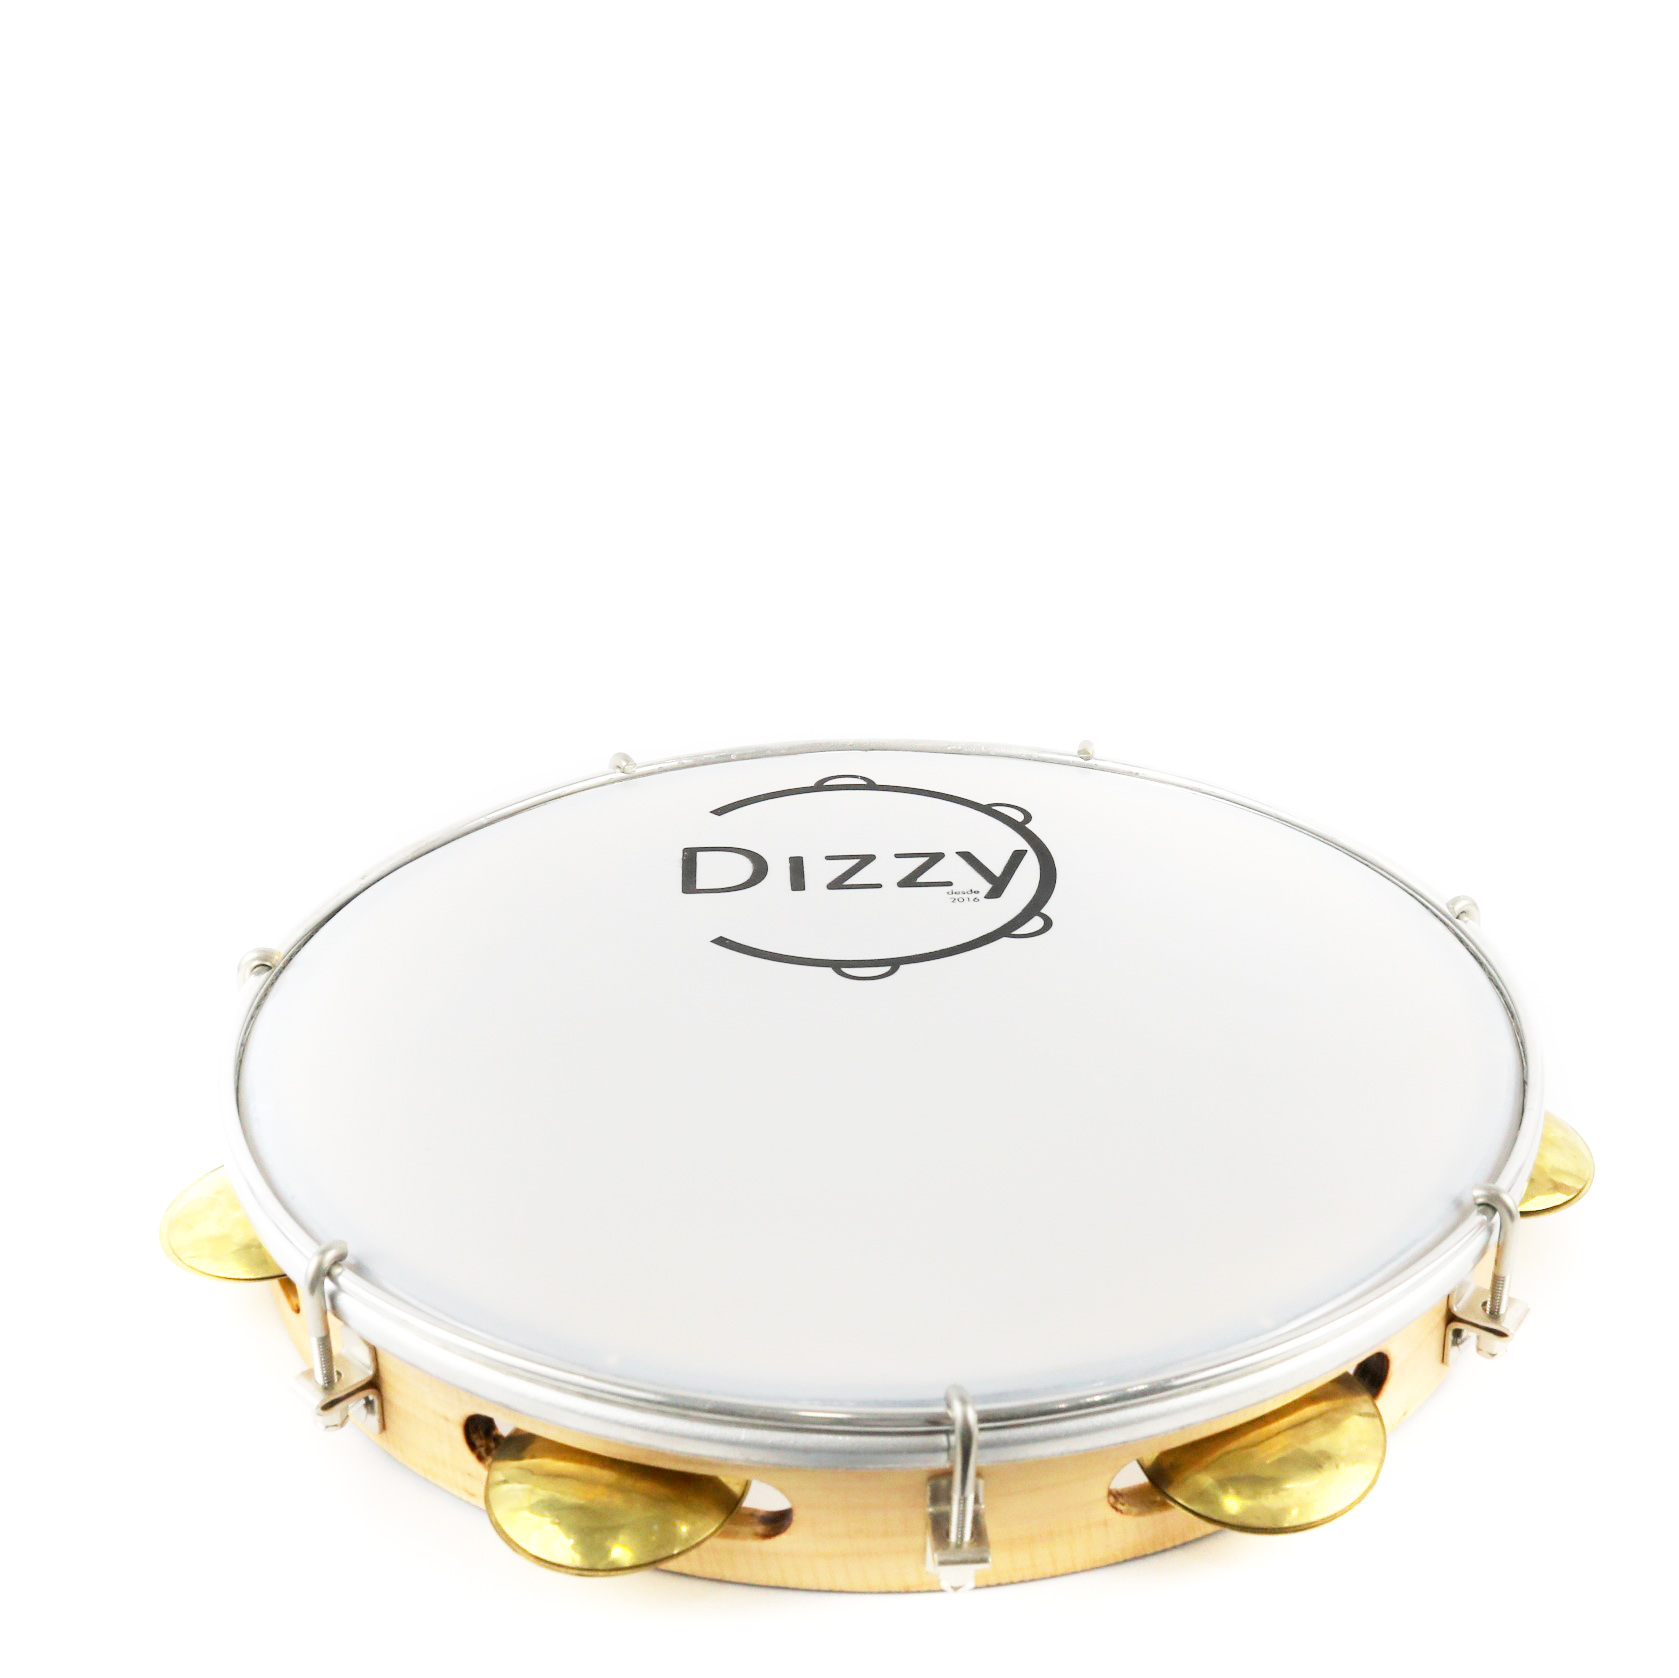 Pandeiro Dizzy 11 Pol Super Leve Marrom Claro